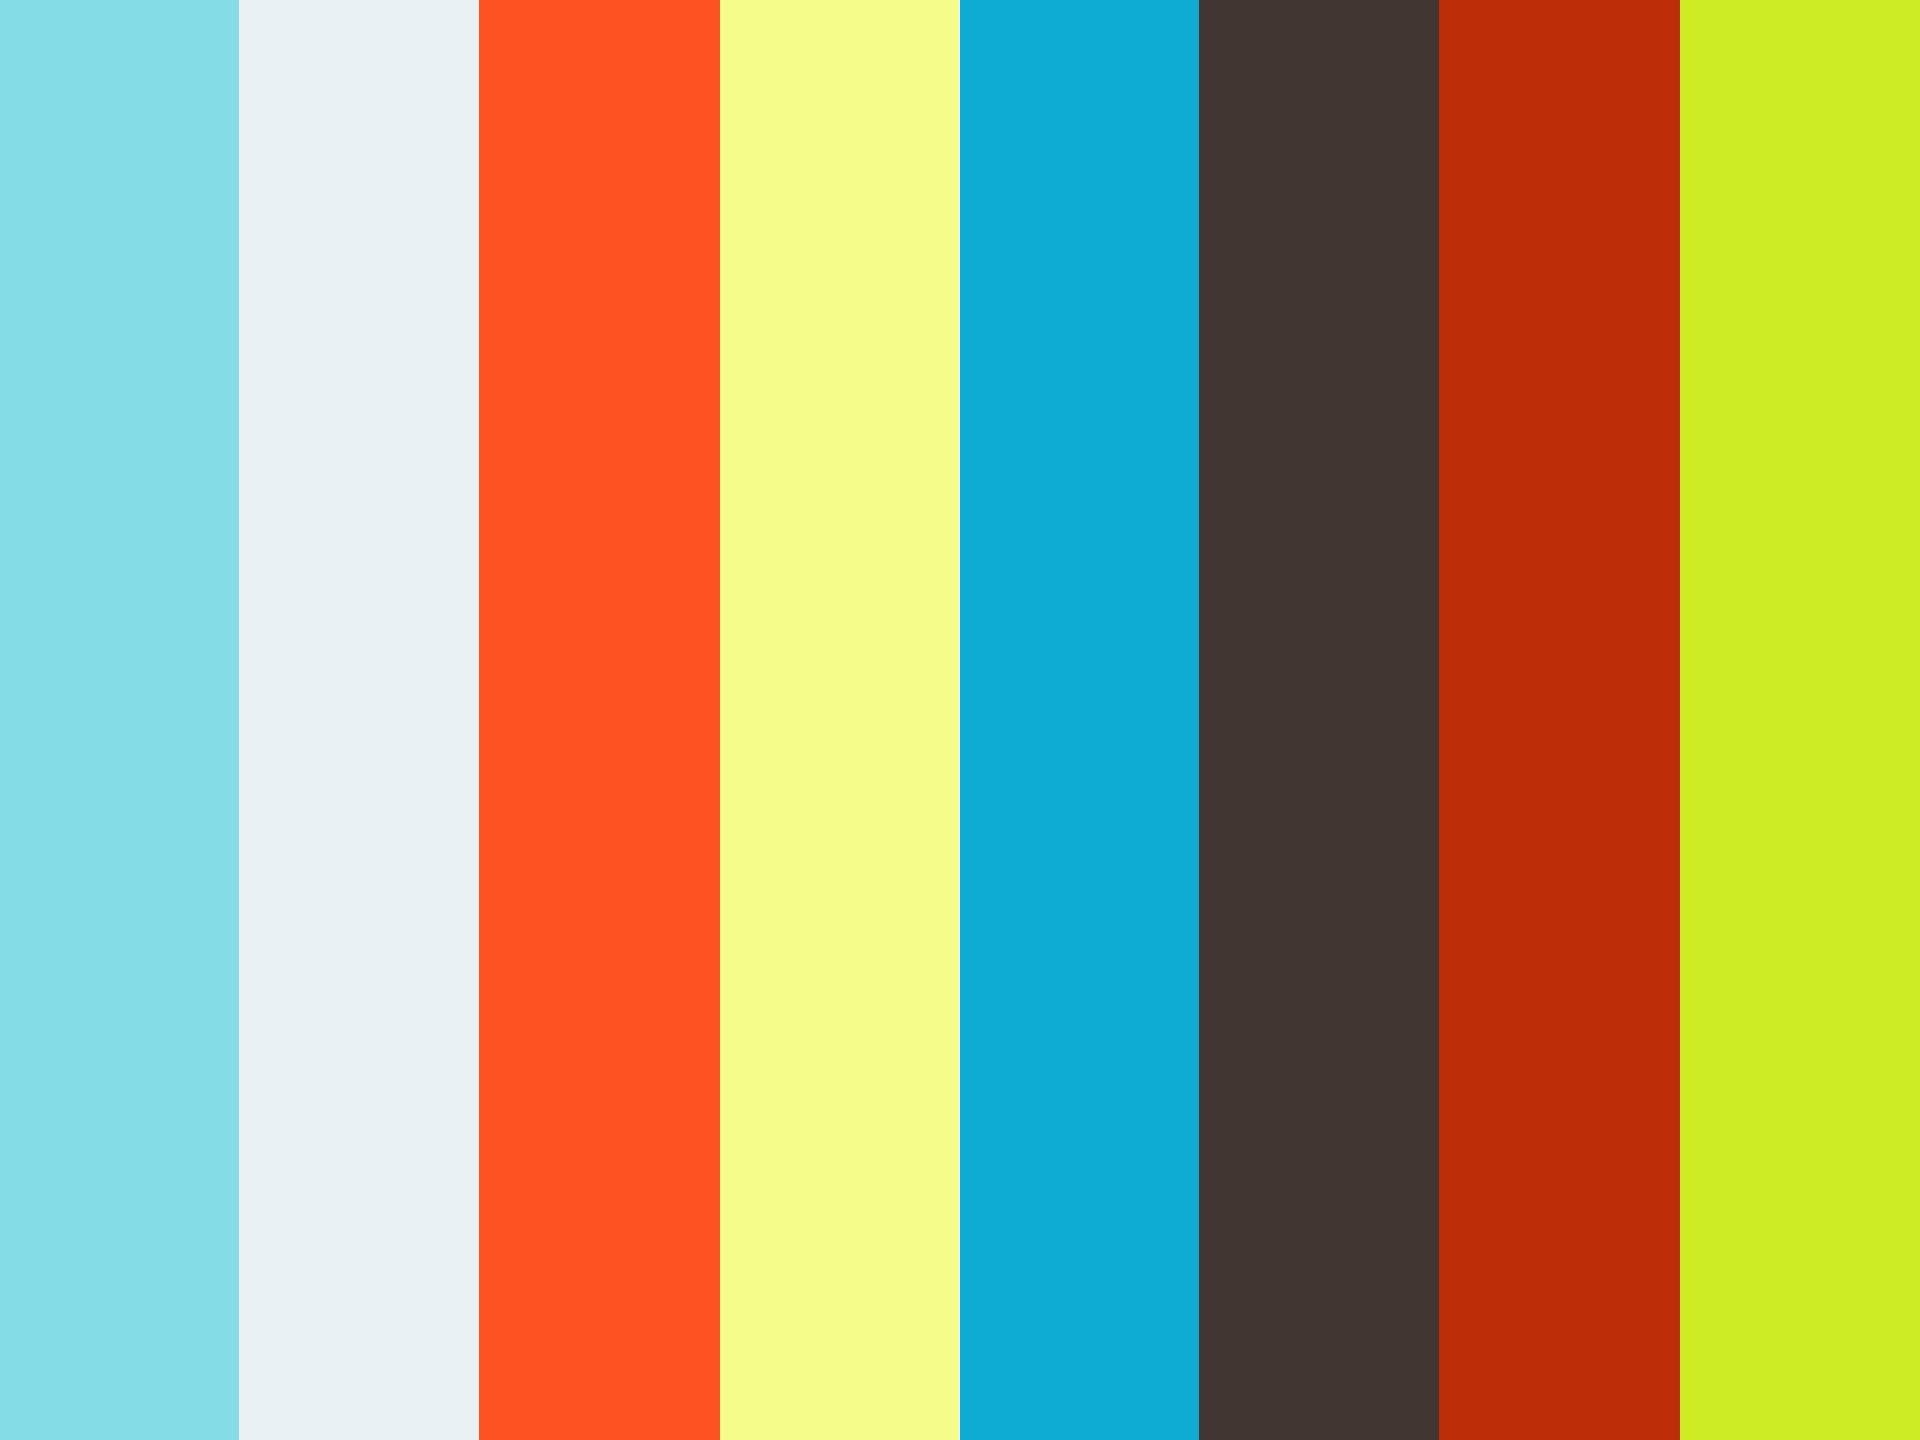 Pixlr editor-線上圖片編輯工具教學1-文字編輯工具-Photoshop簡易版替代on Vimeo